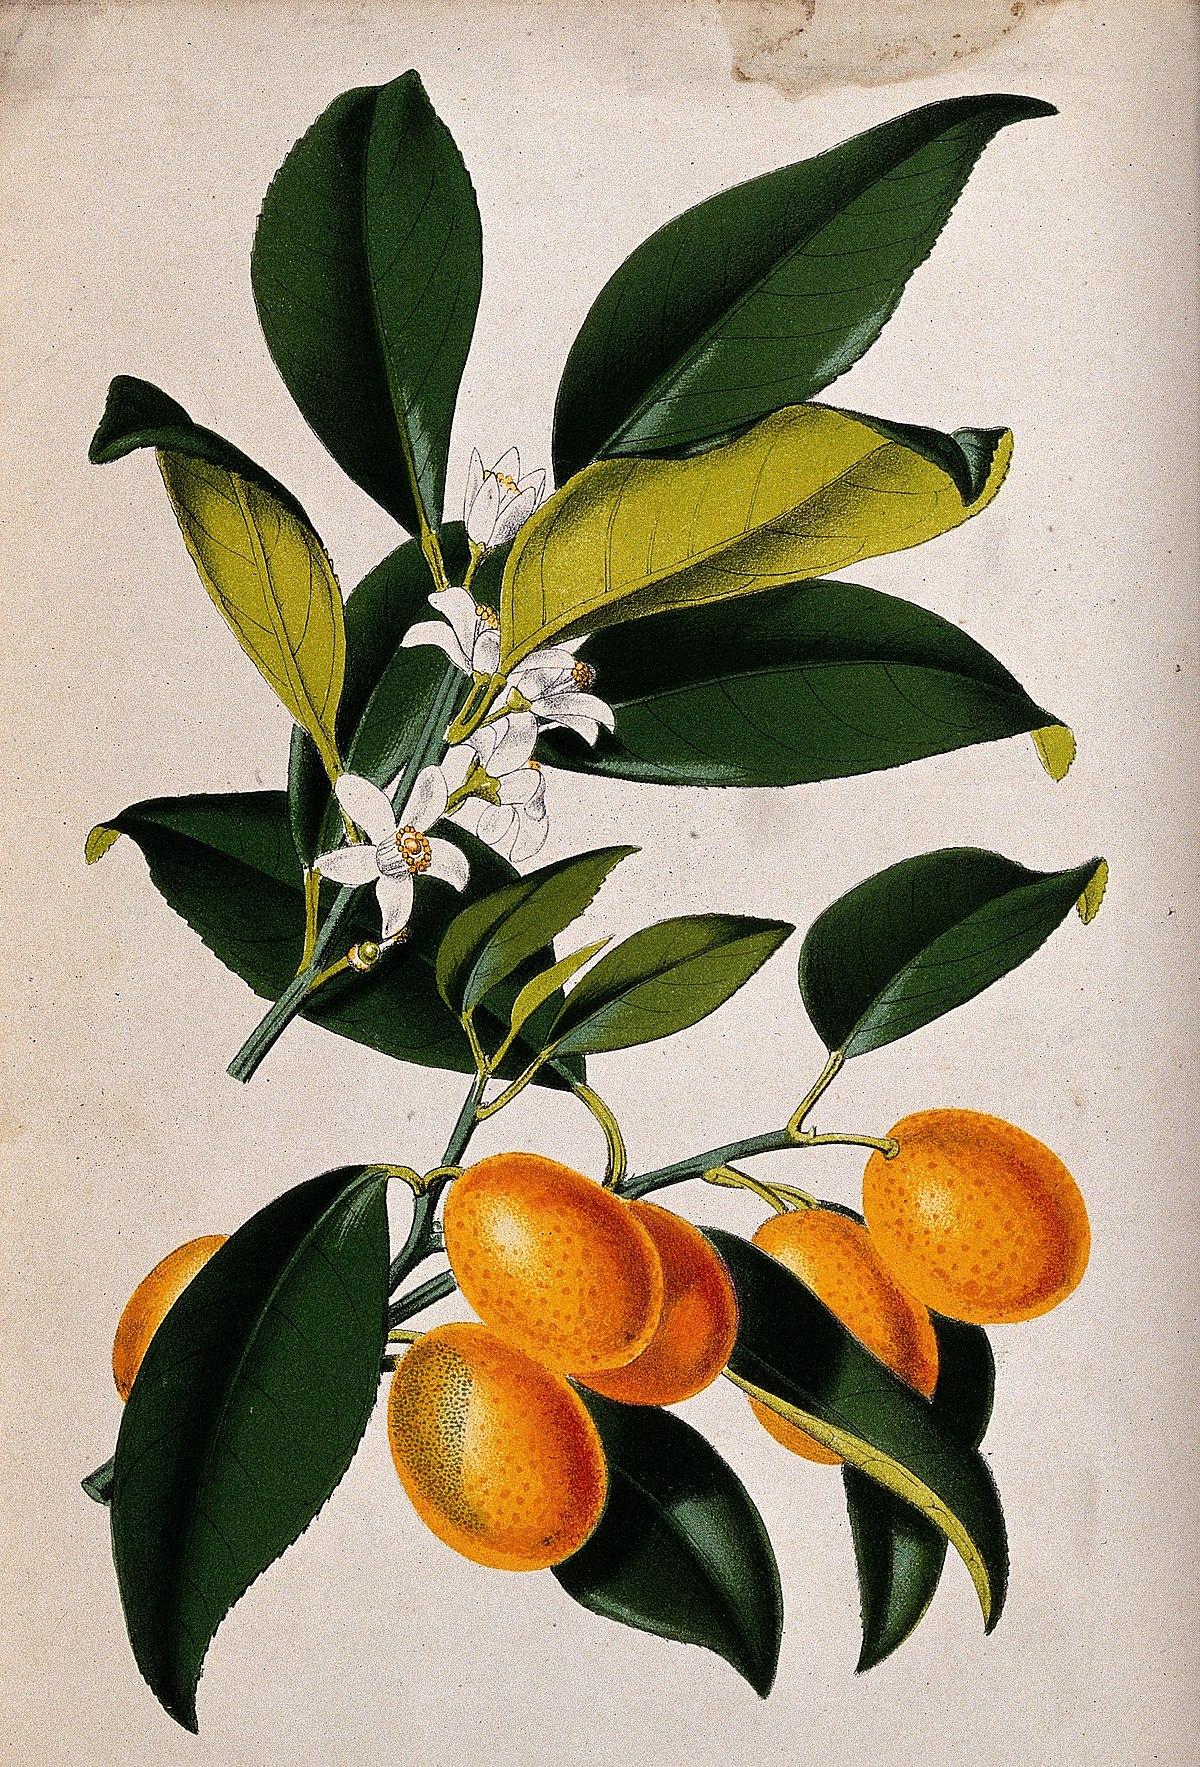 A lemon plant (Citrus japonica); flowering and fruiting stem Wellcome V0044760.jpg